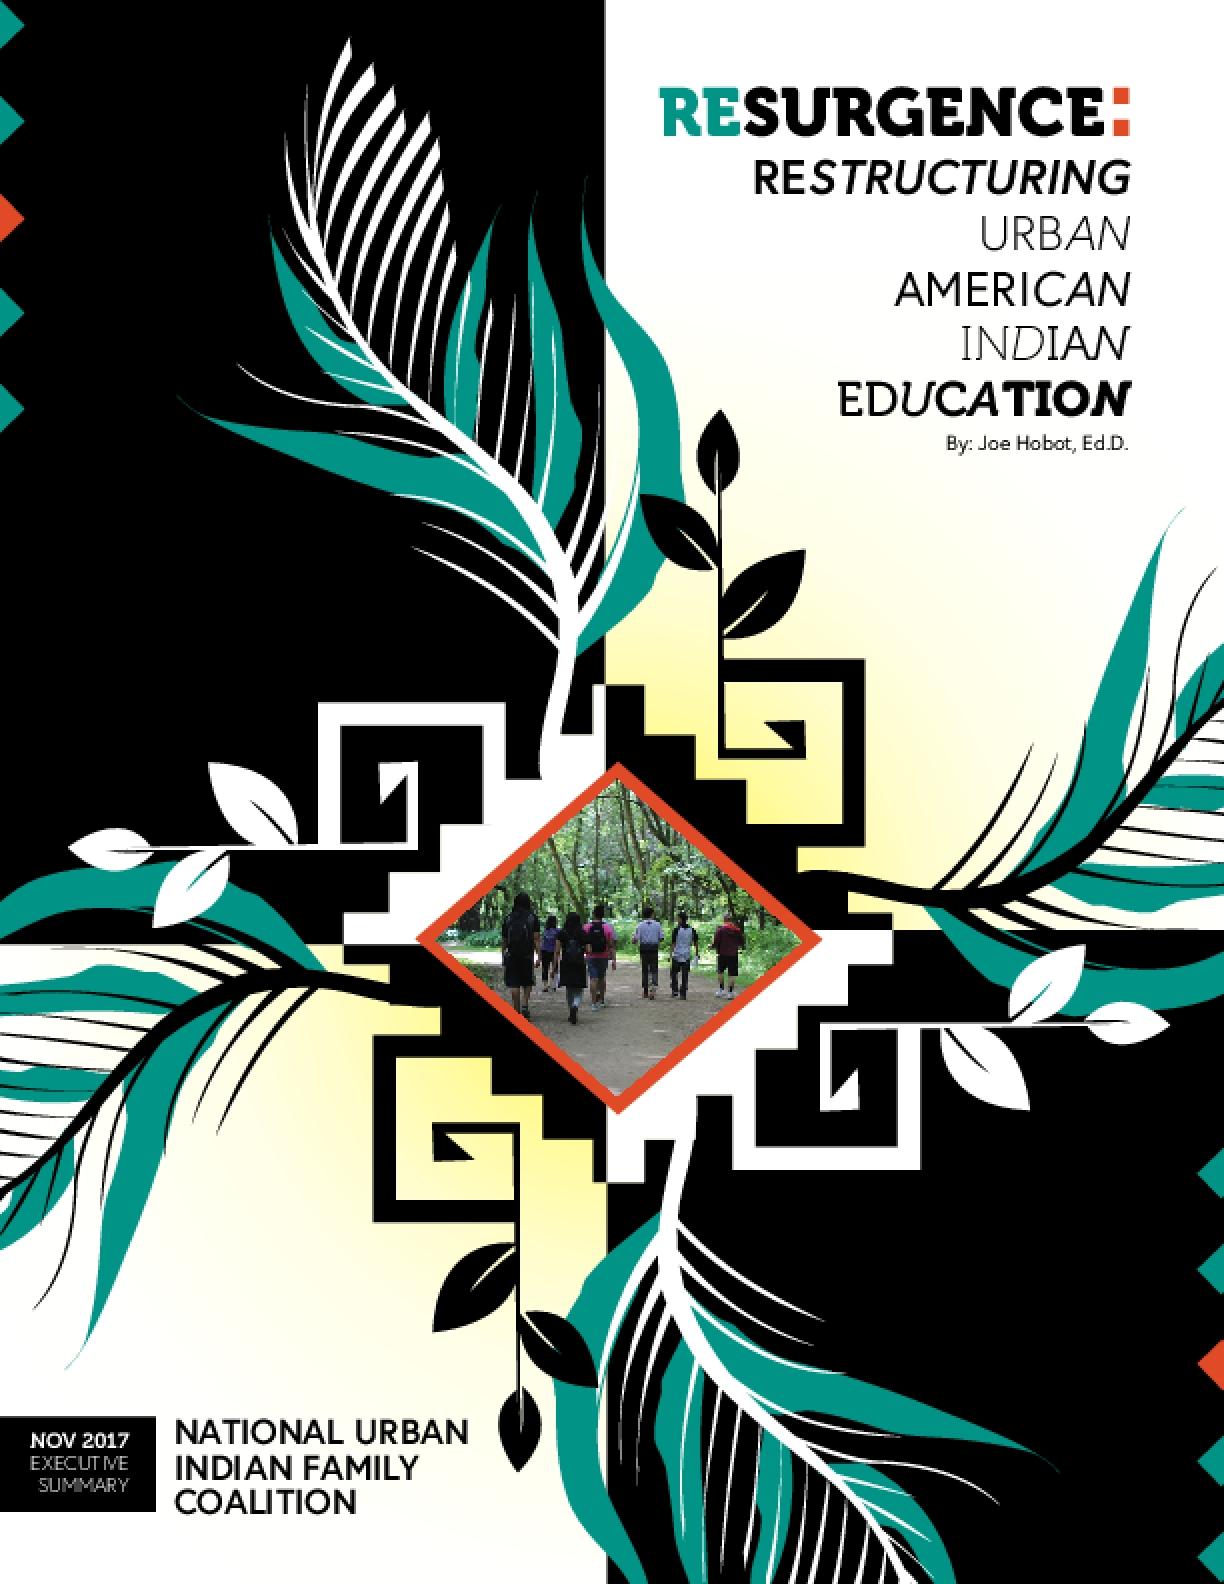 Resurgence: Restructuring Urban American Indian Education